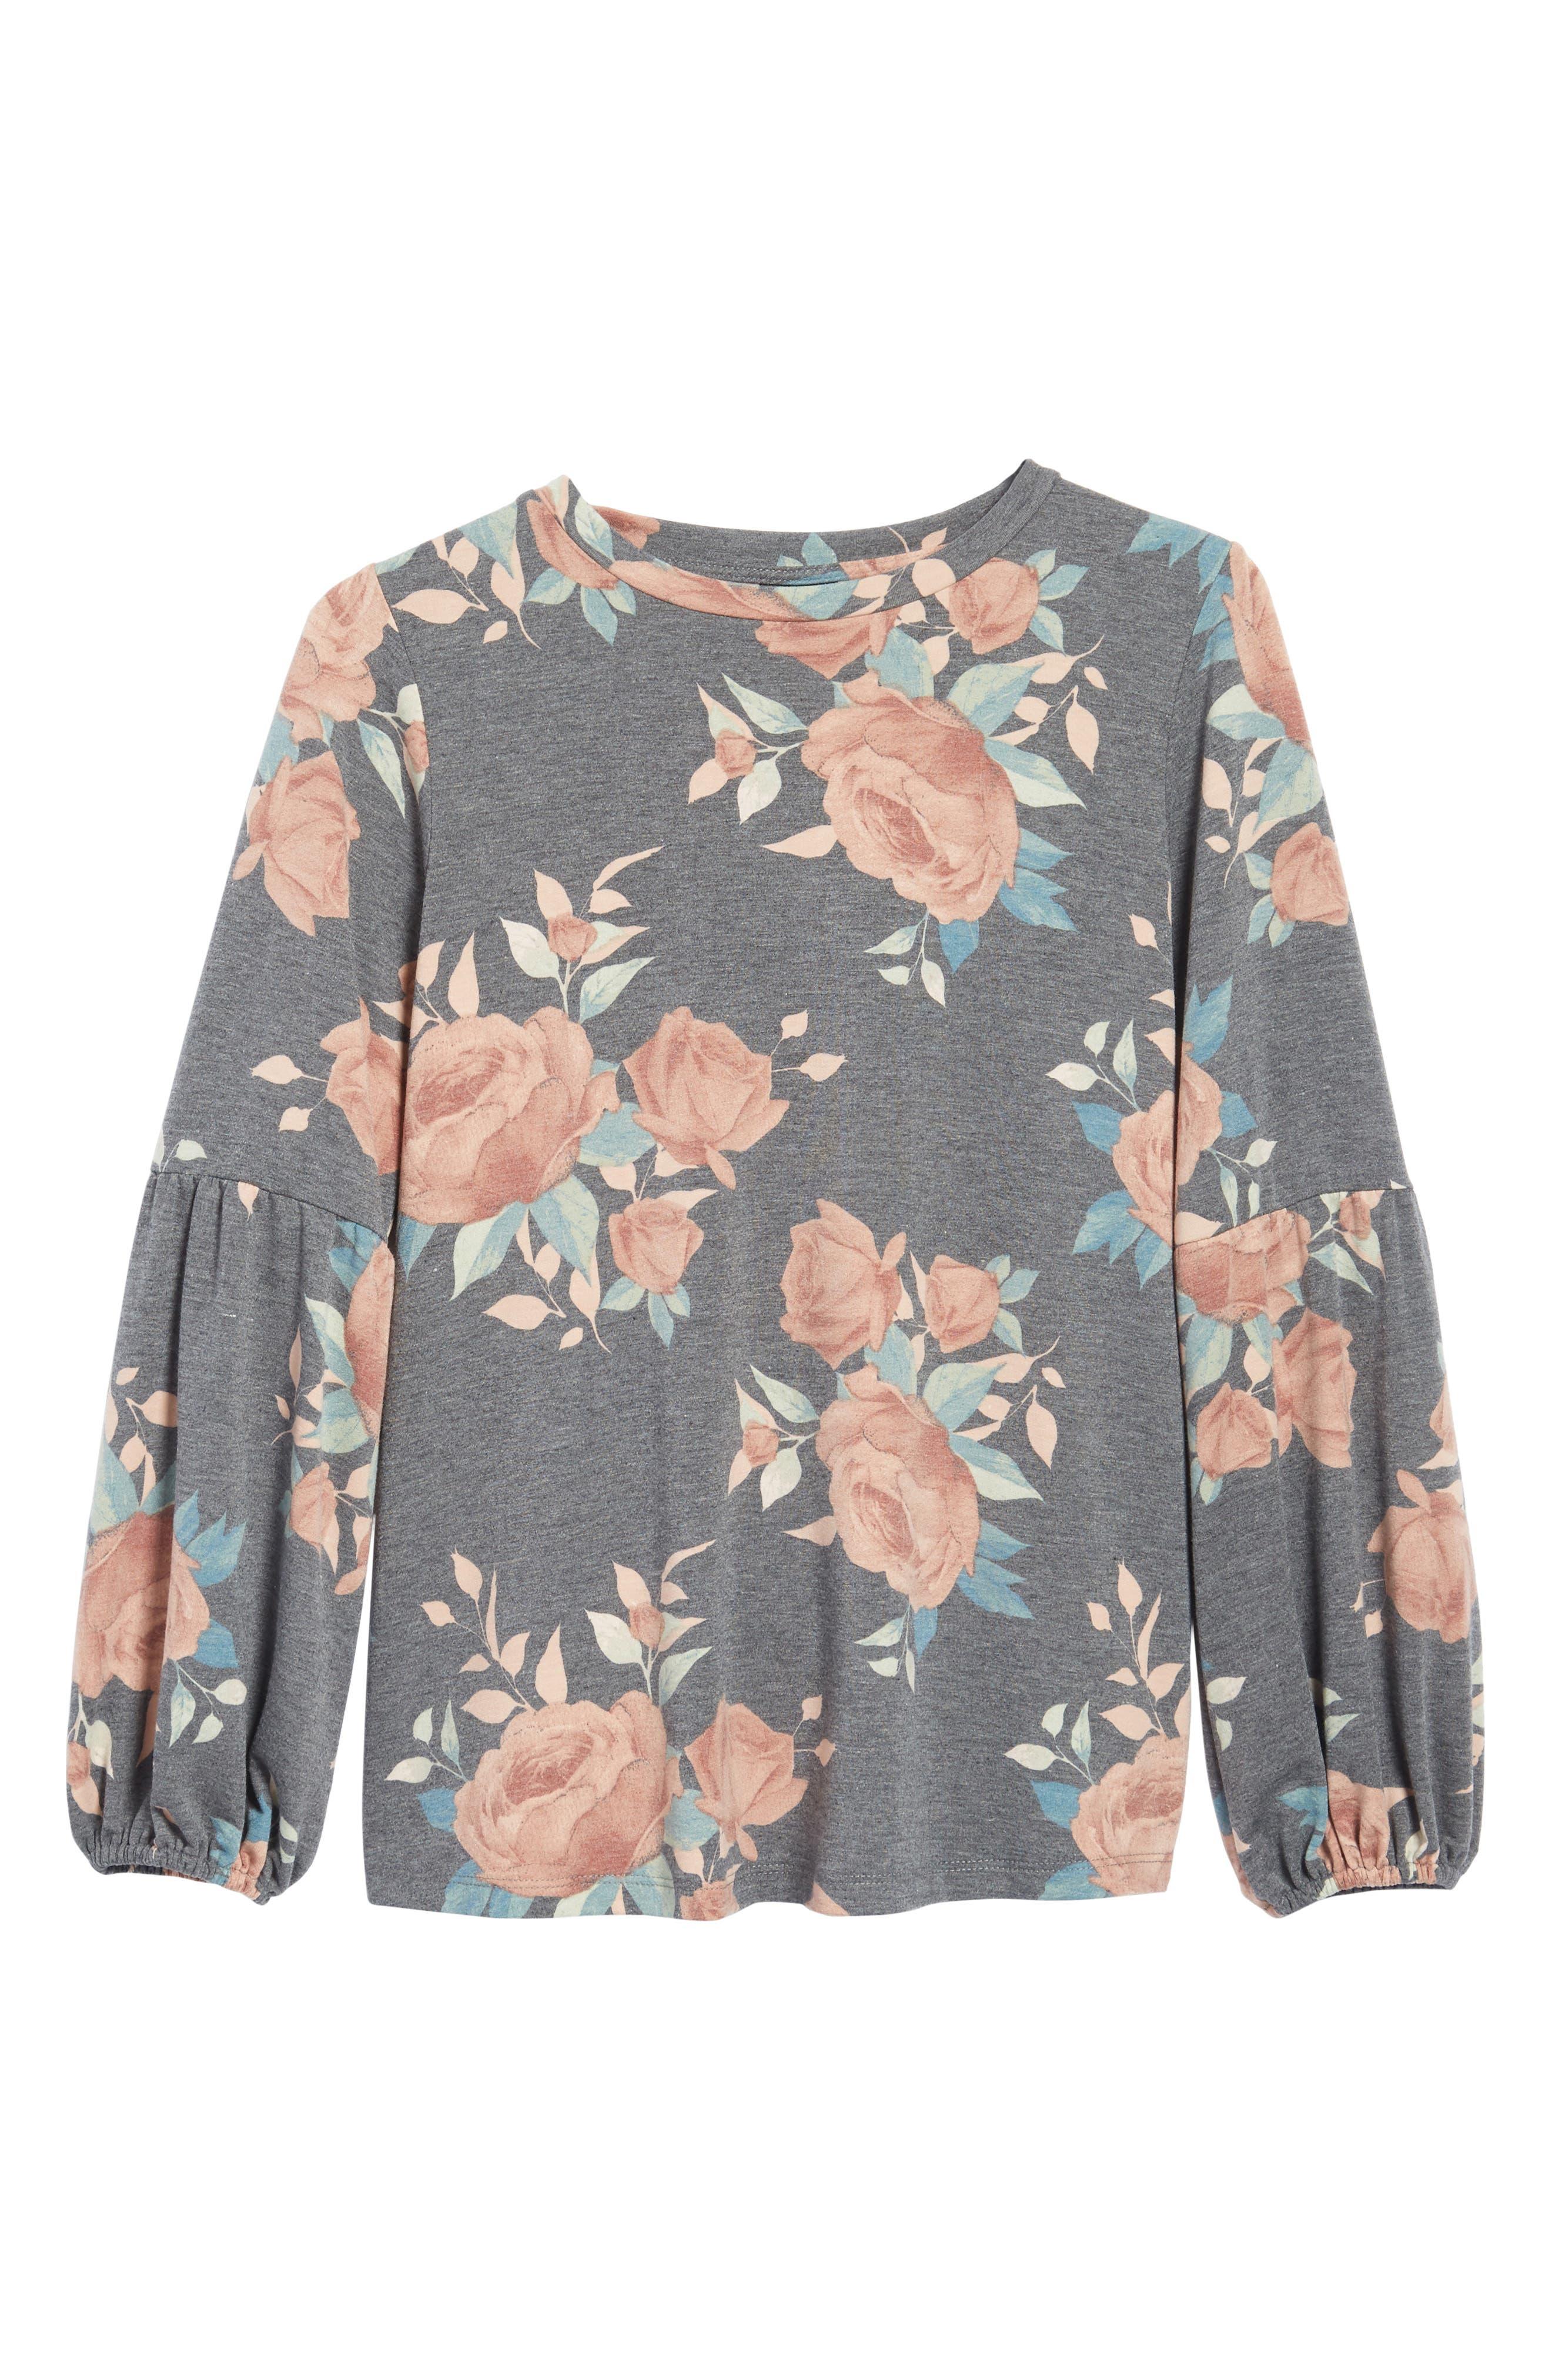 Floral Print Balloon Sleeve Sweatshirt,                             Alternate thumbnail 6, color,                             Black/ Blush